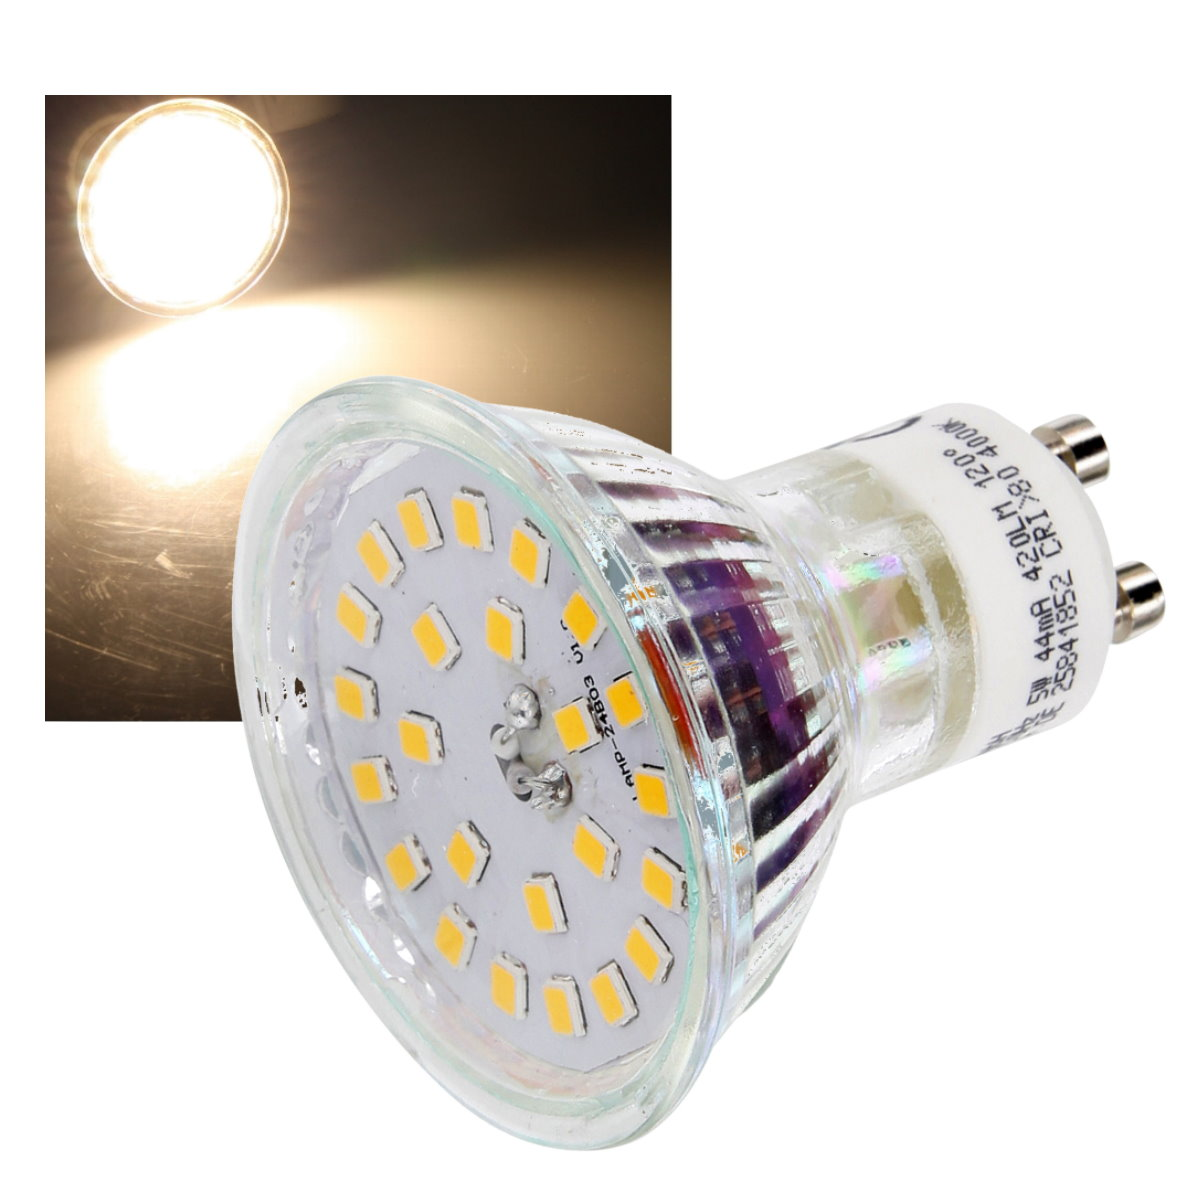 led strahler spot leuchtmittel gu10 230v mr16 120 5w 400lm licht lampe ebay